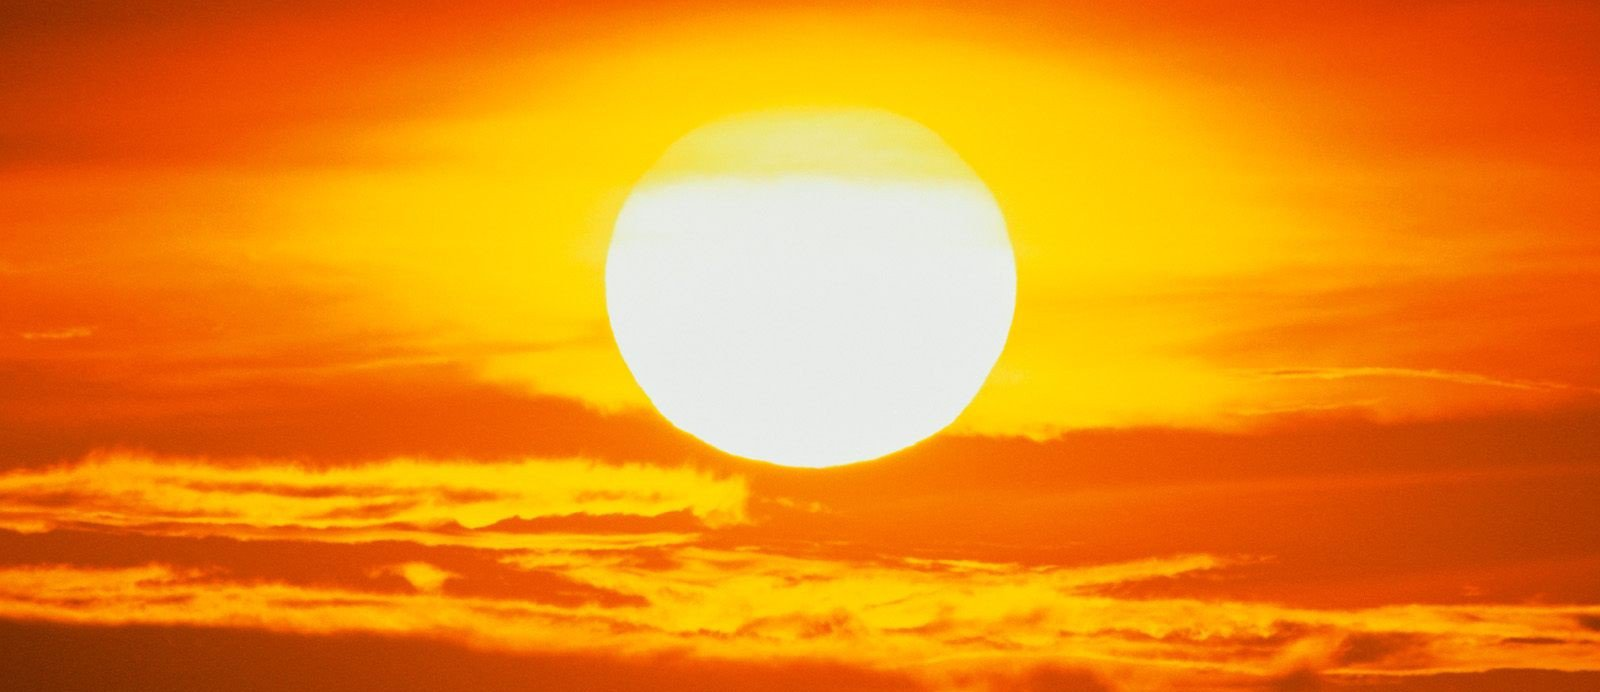 Saiba curiosidades sobre o Sol